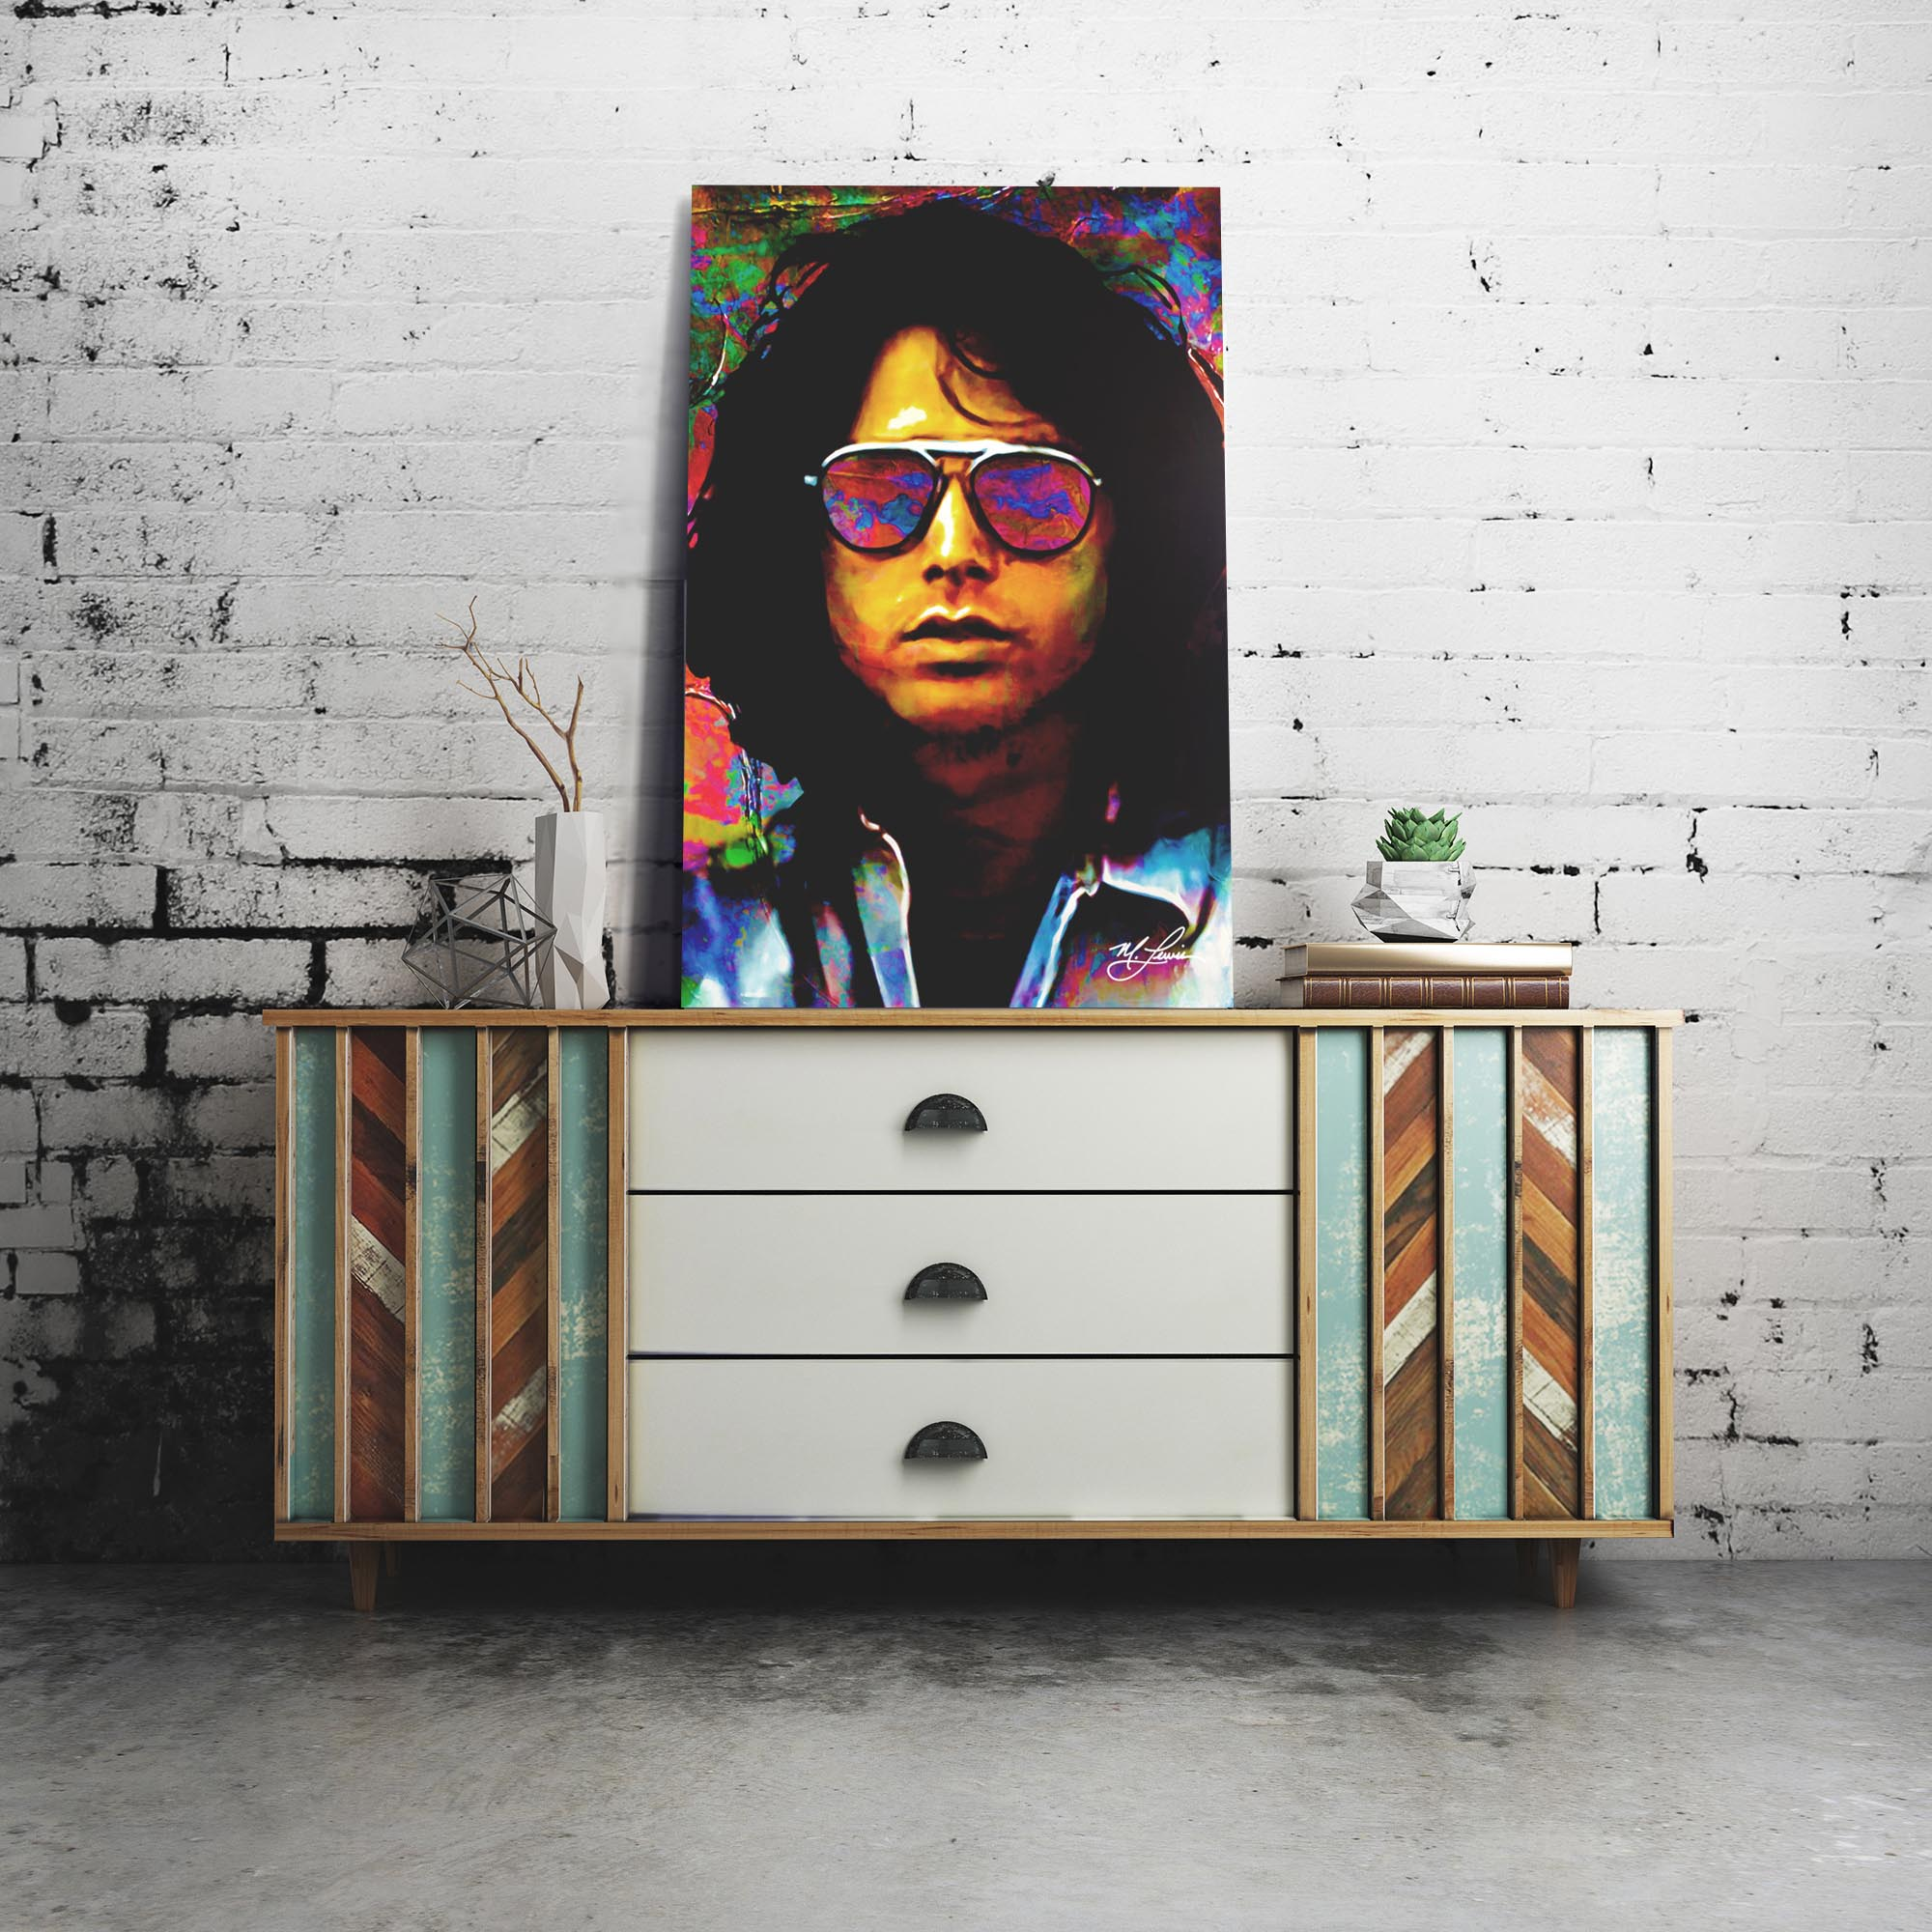 Jim Morrison Insightful Chaos by Mark Lewis - Celebrity Pop Art on Metal or Plexiglass - ML0042